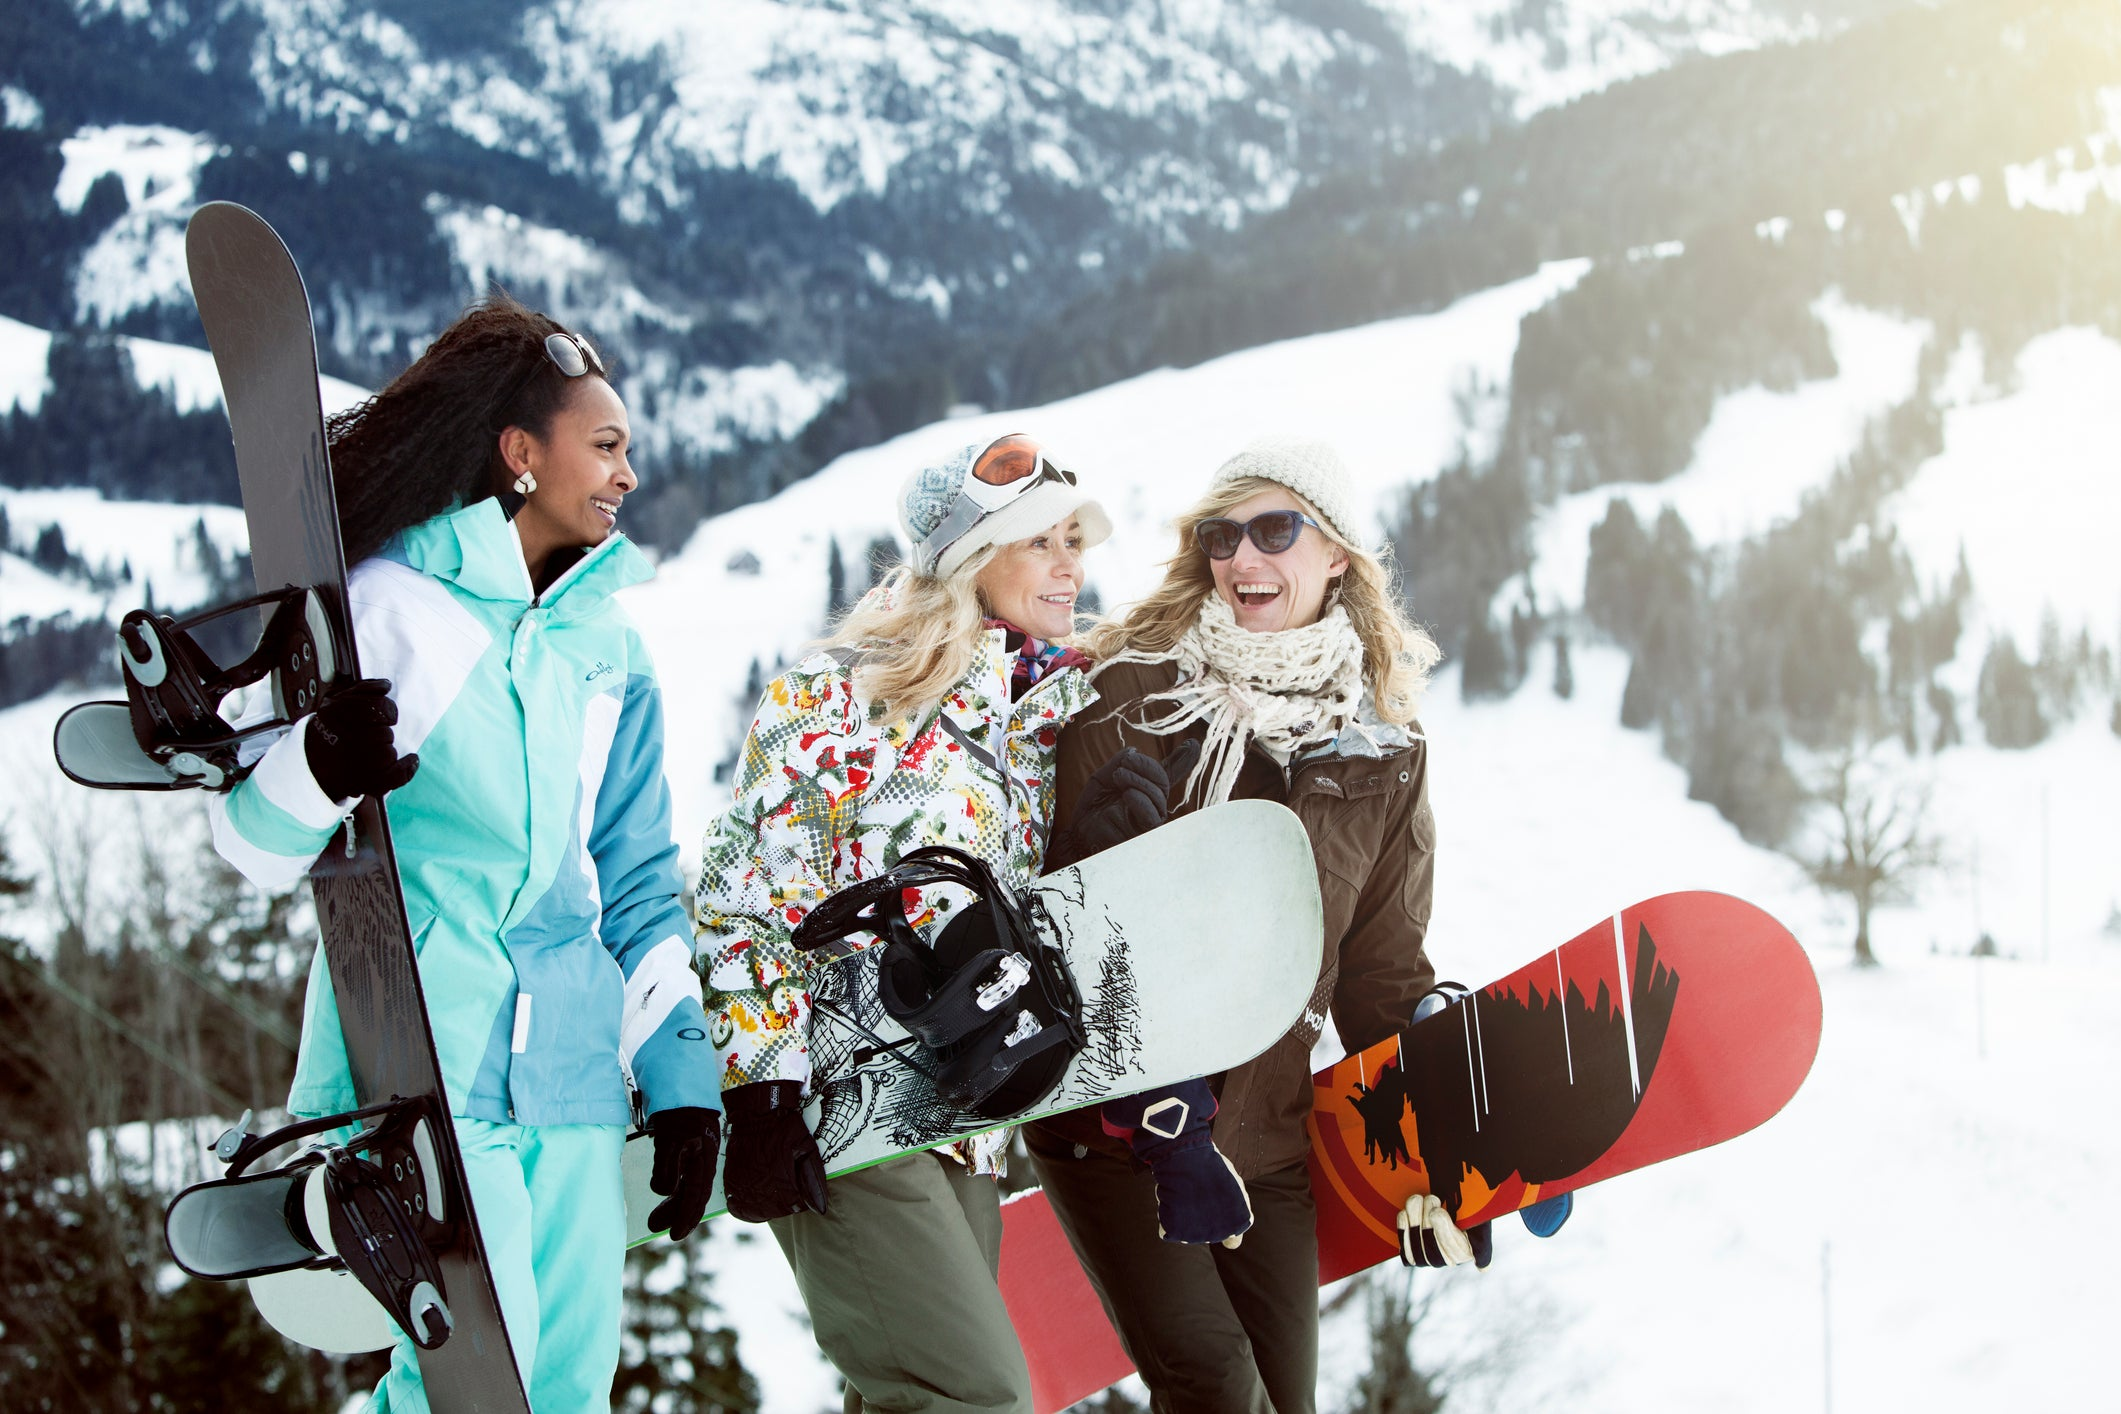 snowboarders.'